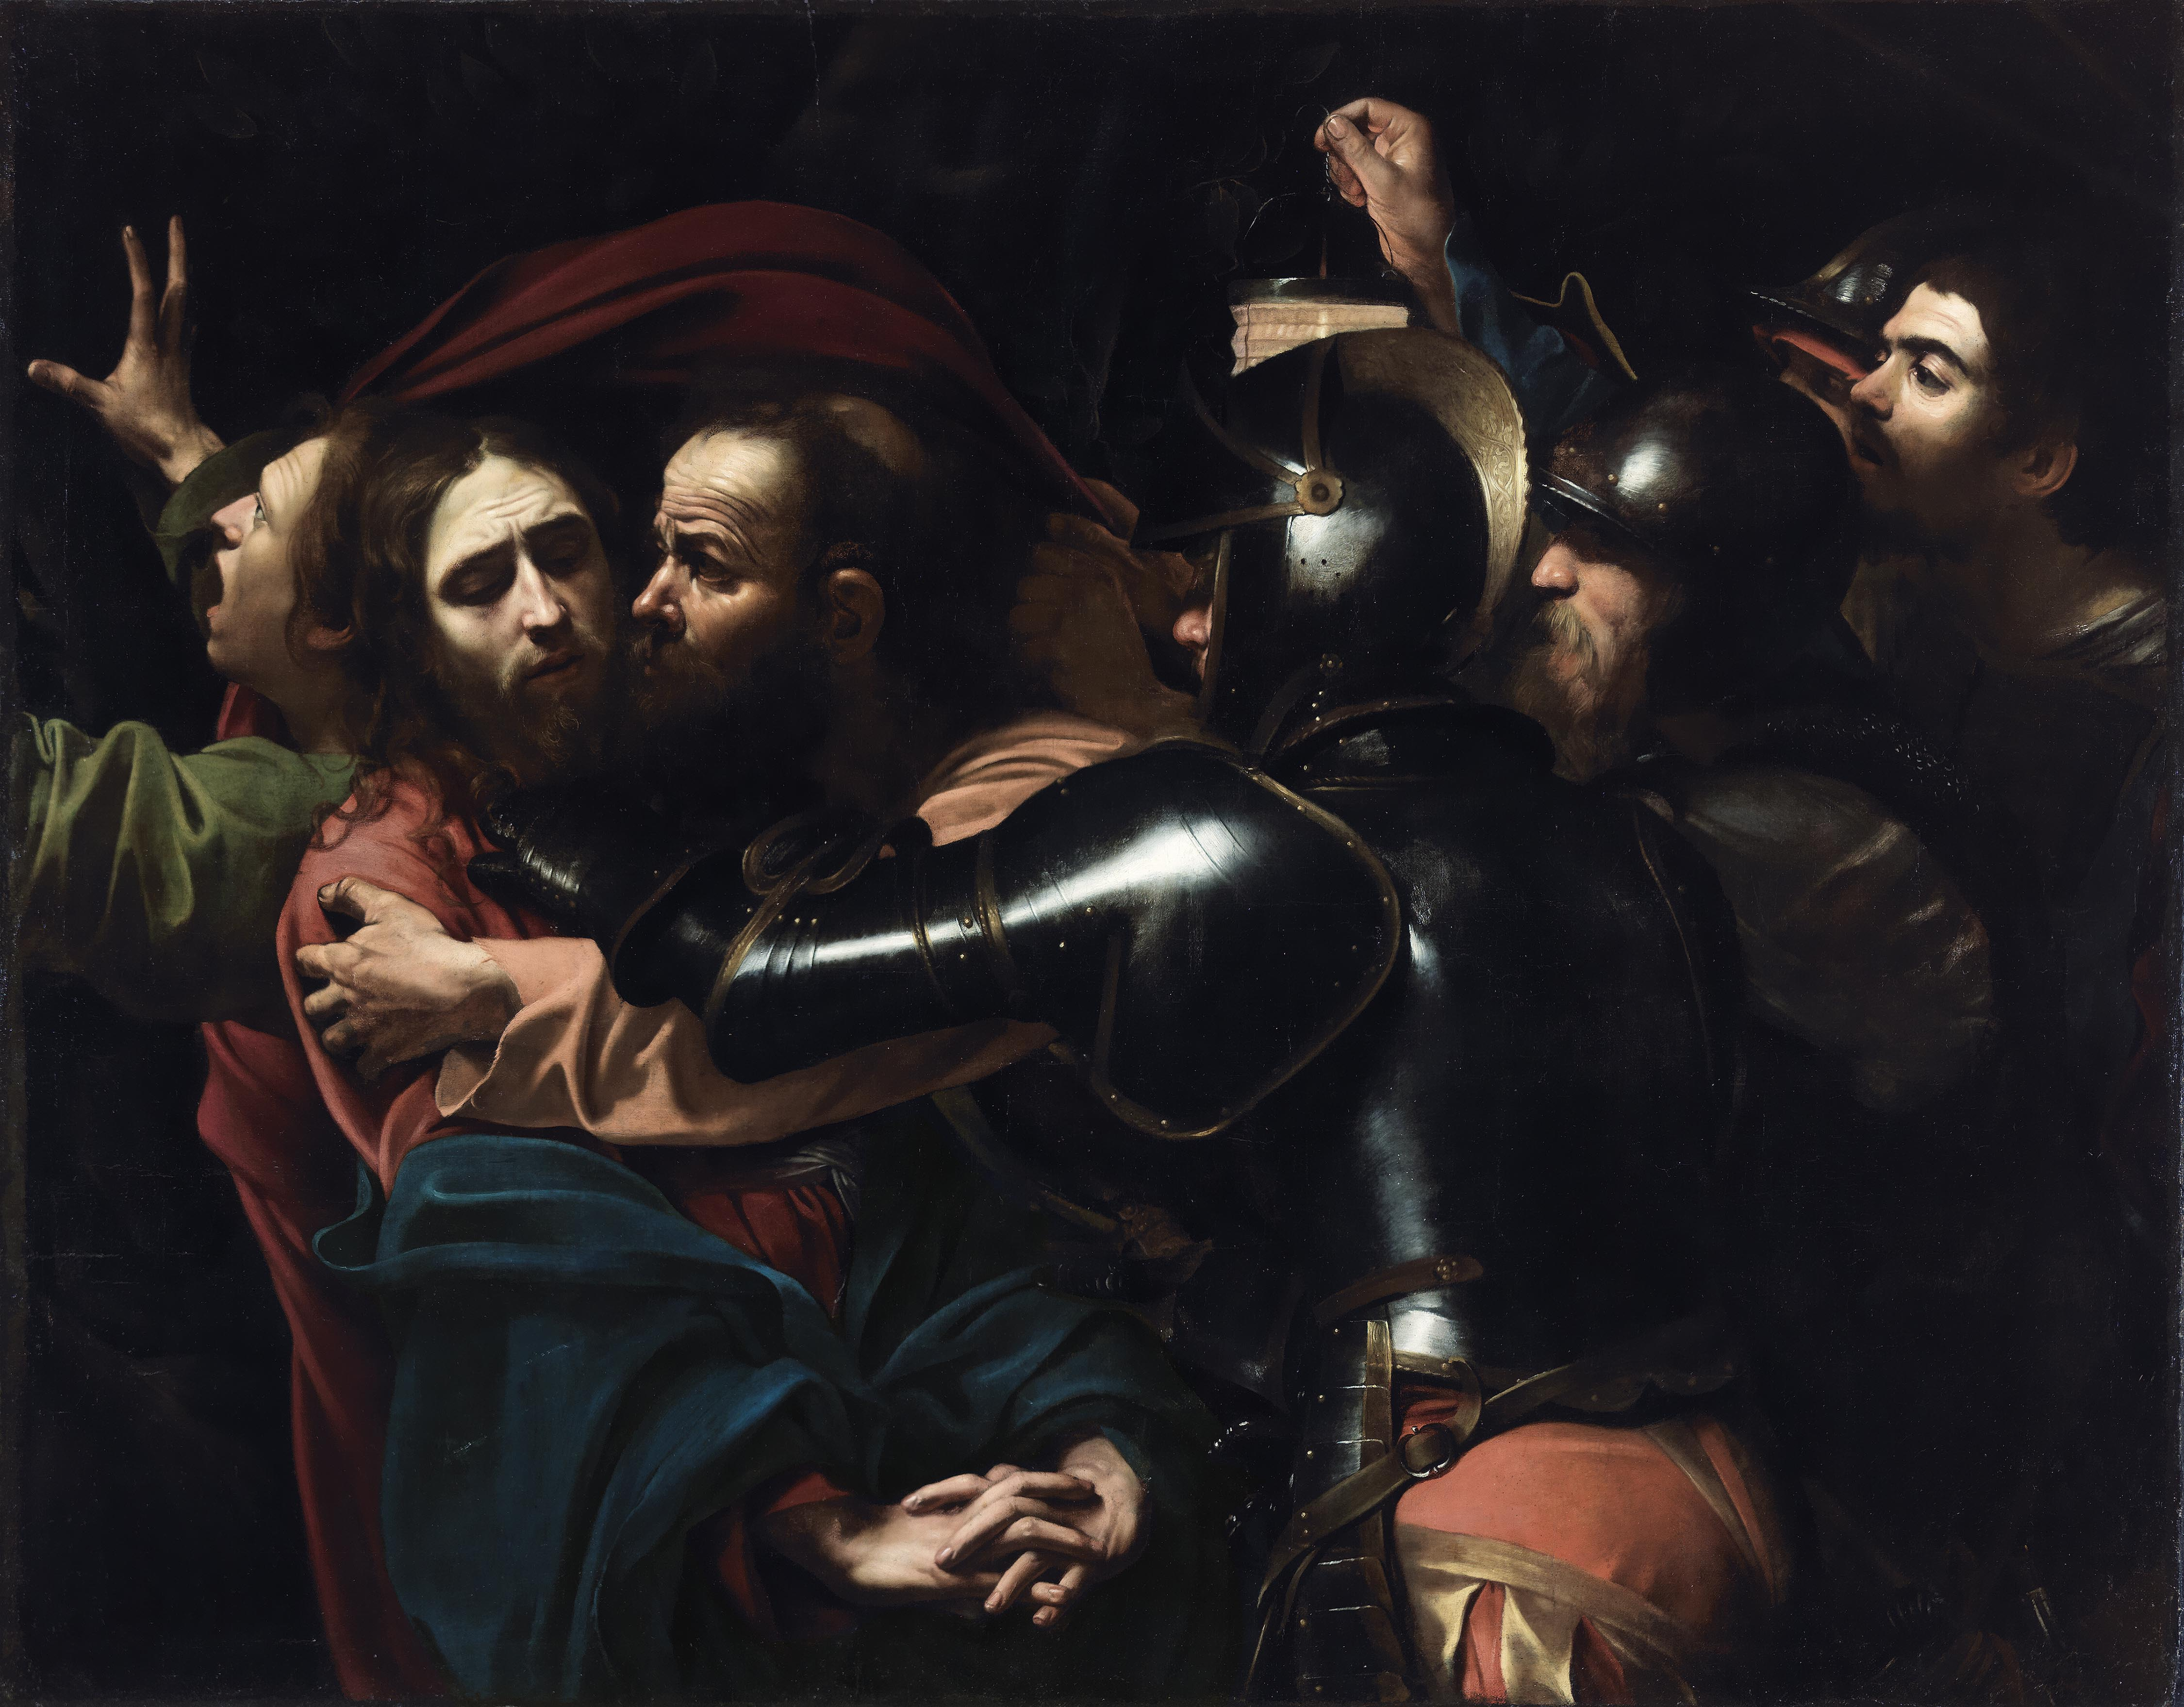 The Taking of Christ Michelangelo Merisi da Caravaggio 1602 © The National Gallery of Ireland, Dublin